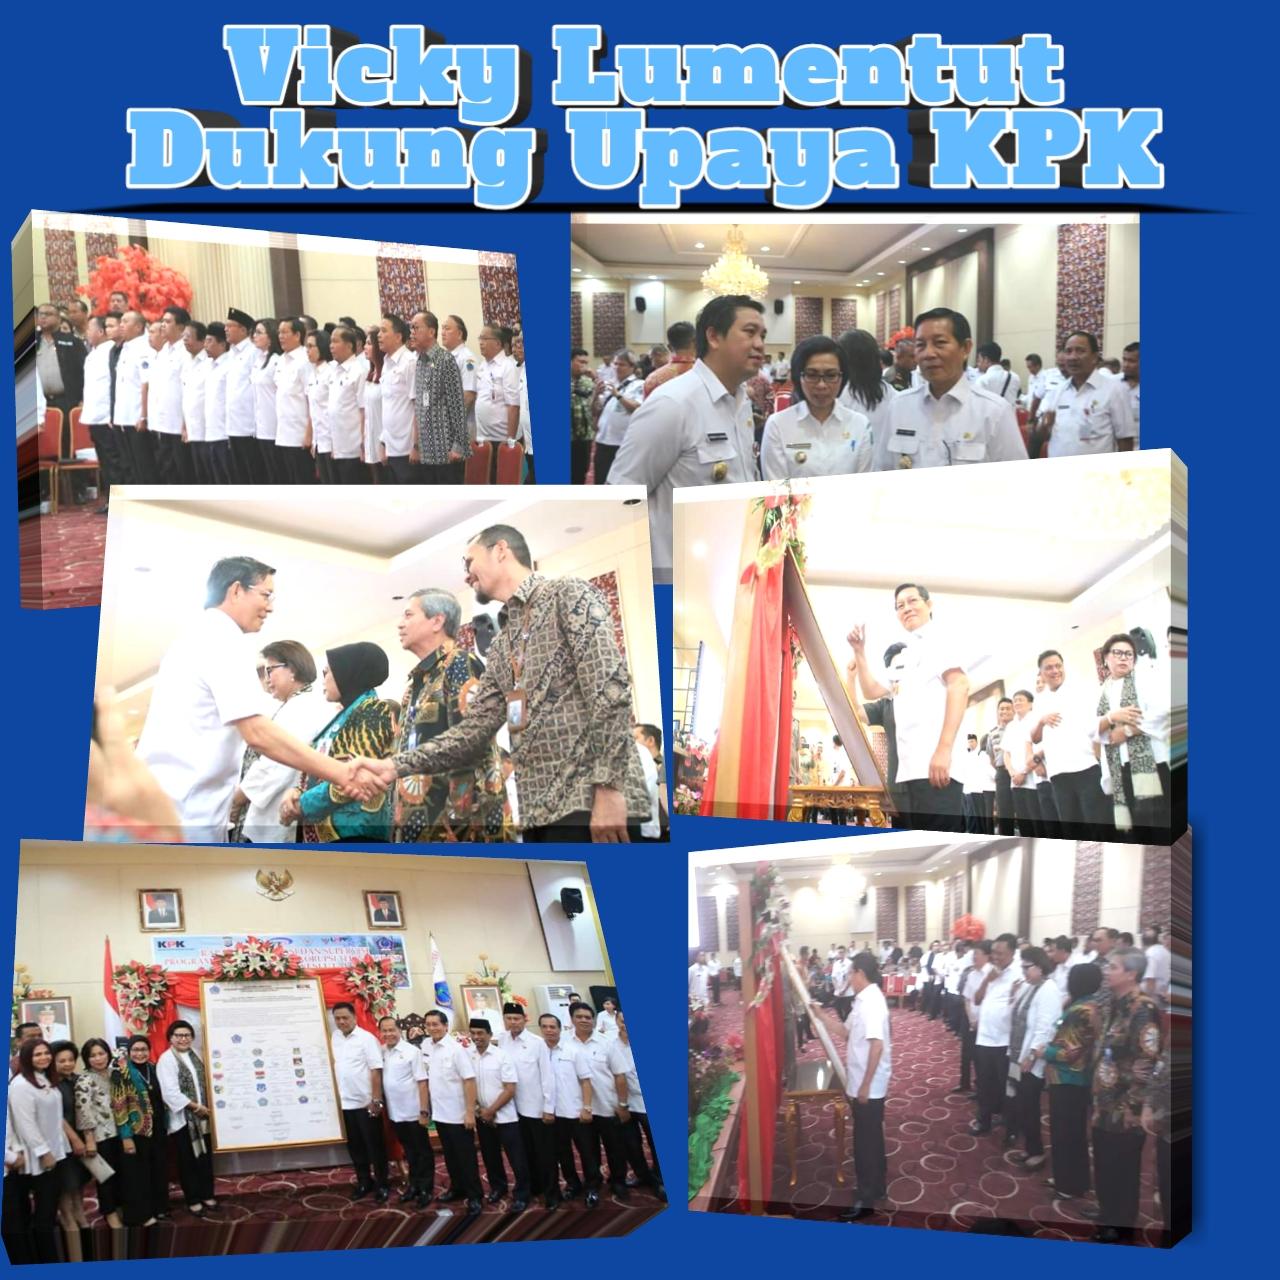 Walikota Manado, Vicky Lumentut, KPK, Korupsi Sulut